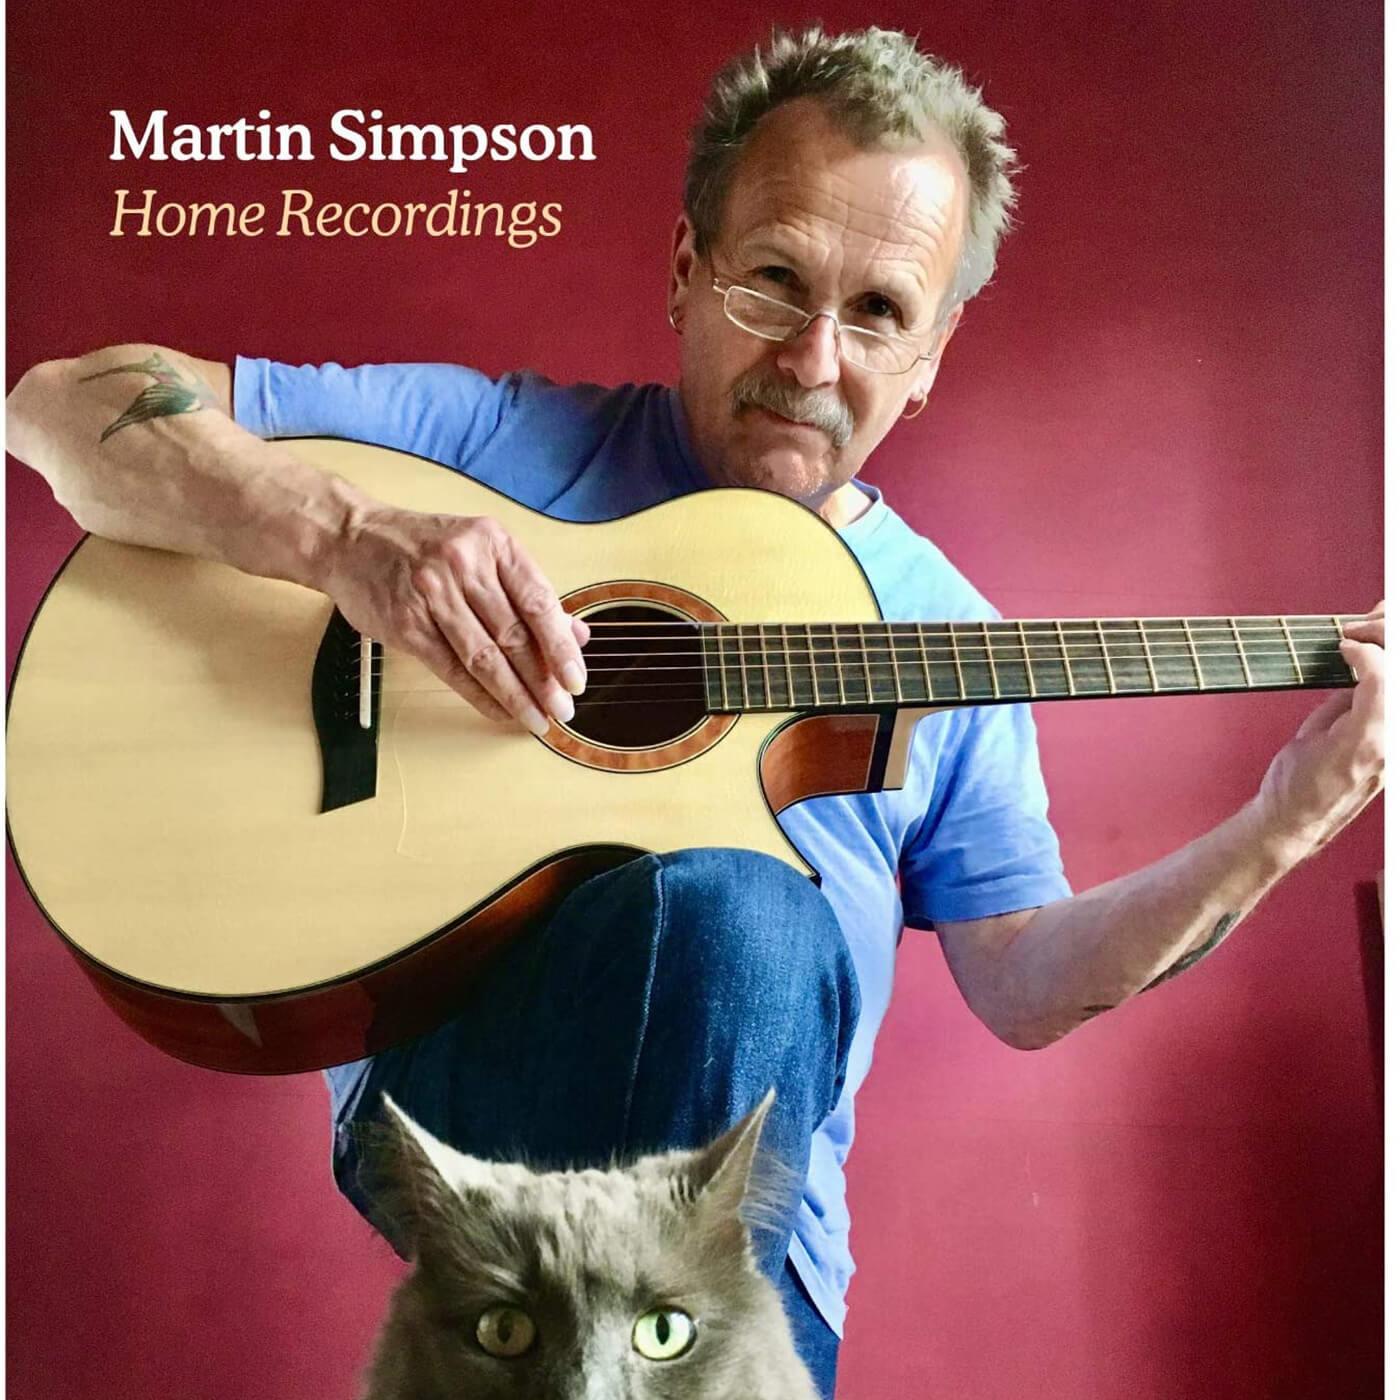 AOTY - Martin Simpson